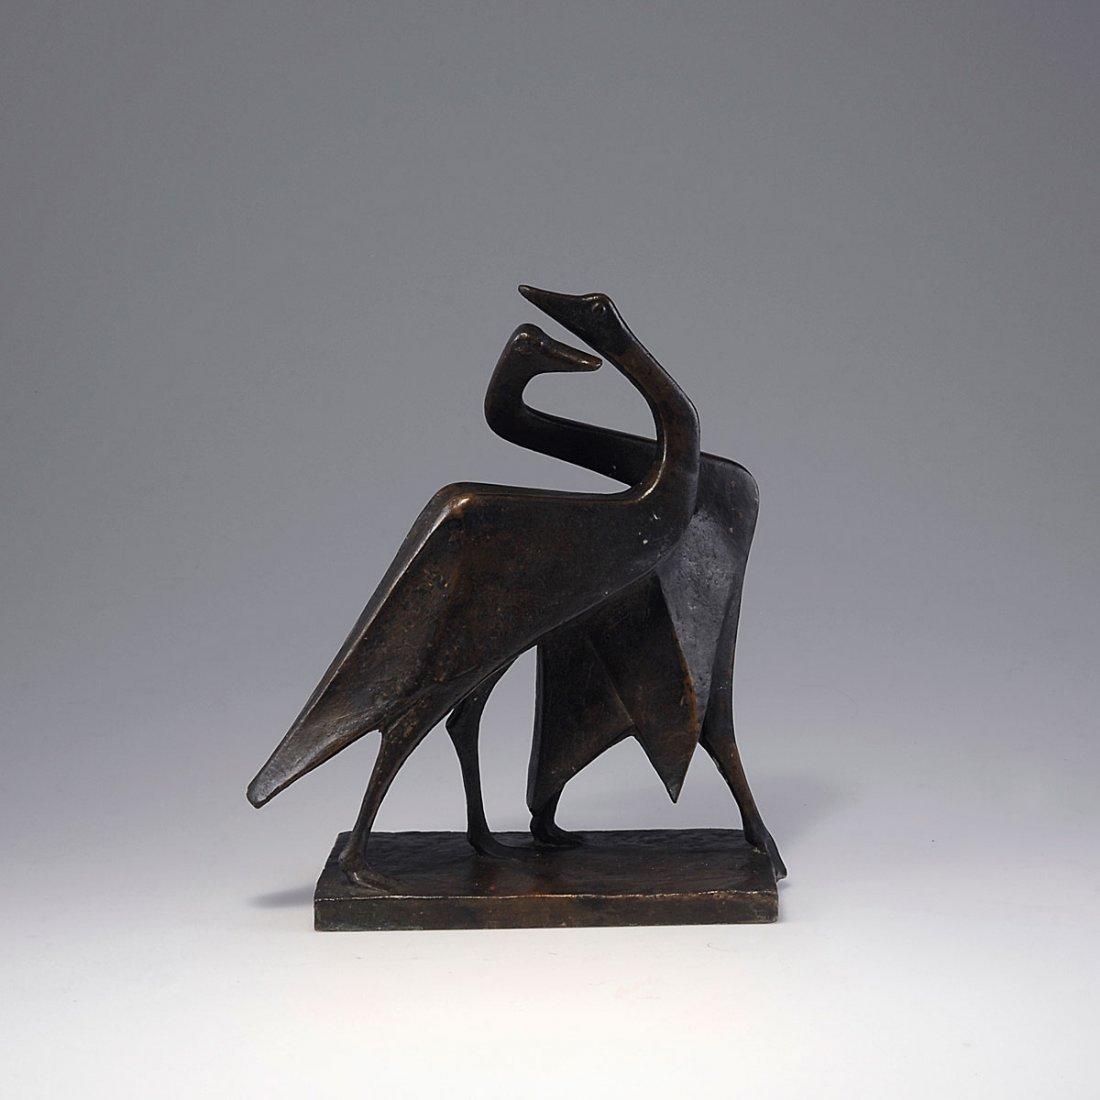 7: 'Water fowl', 1960